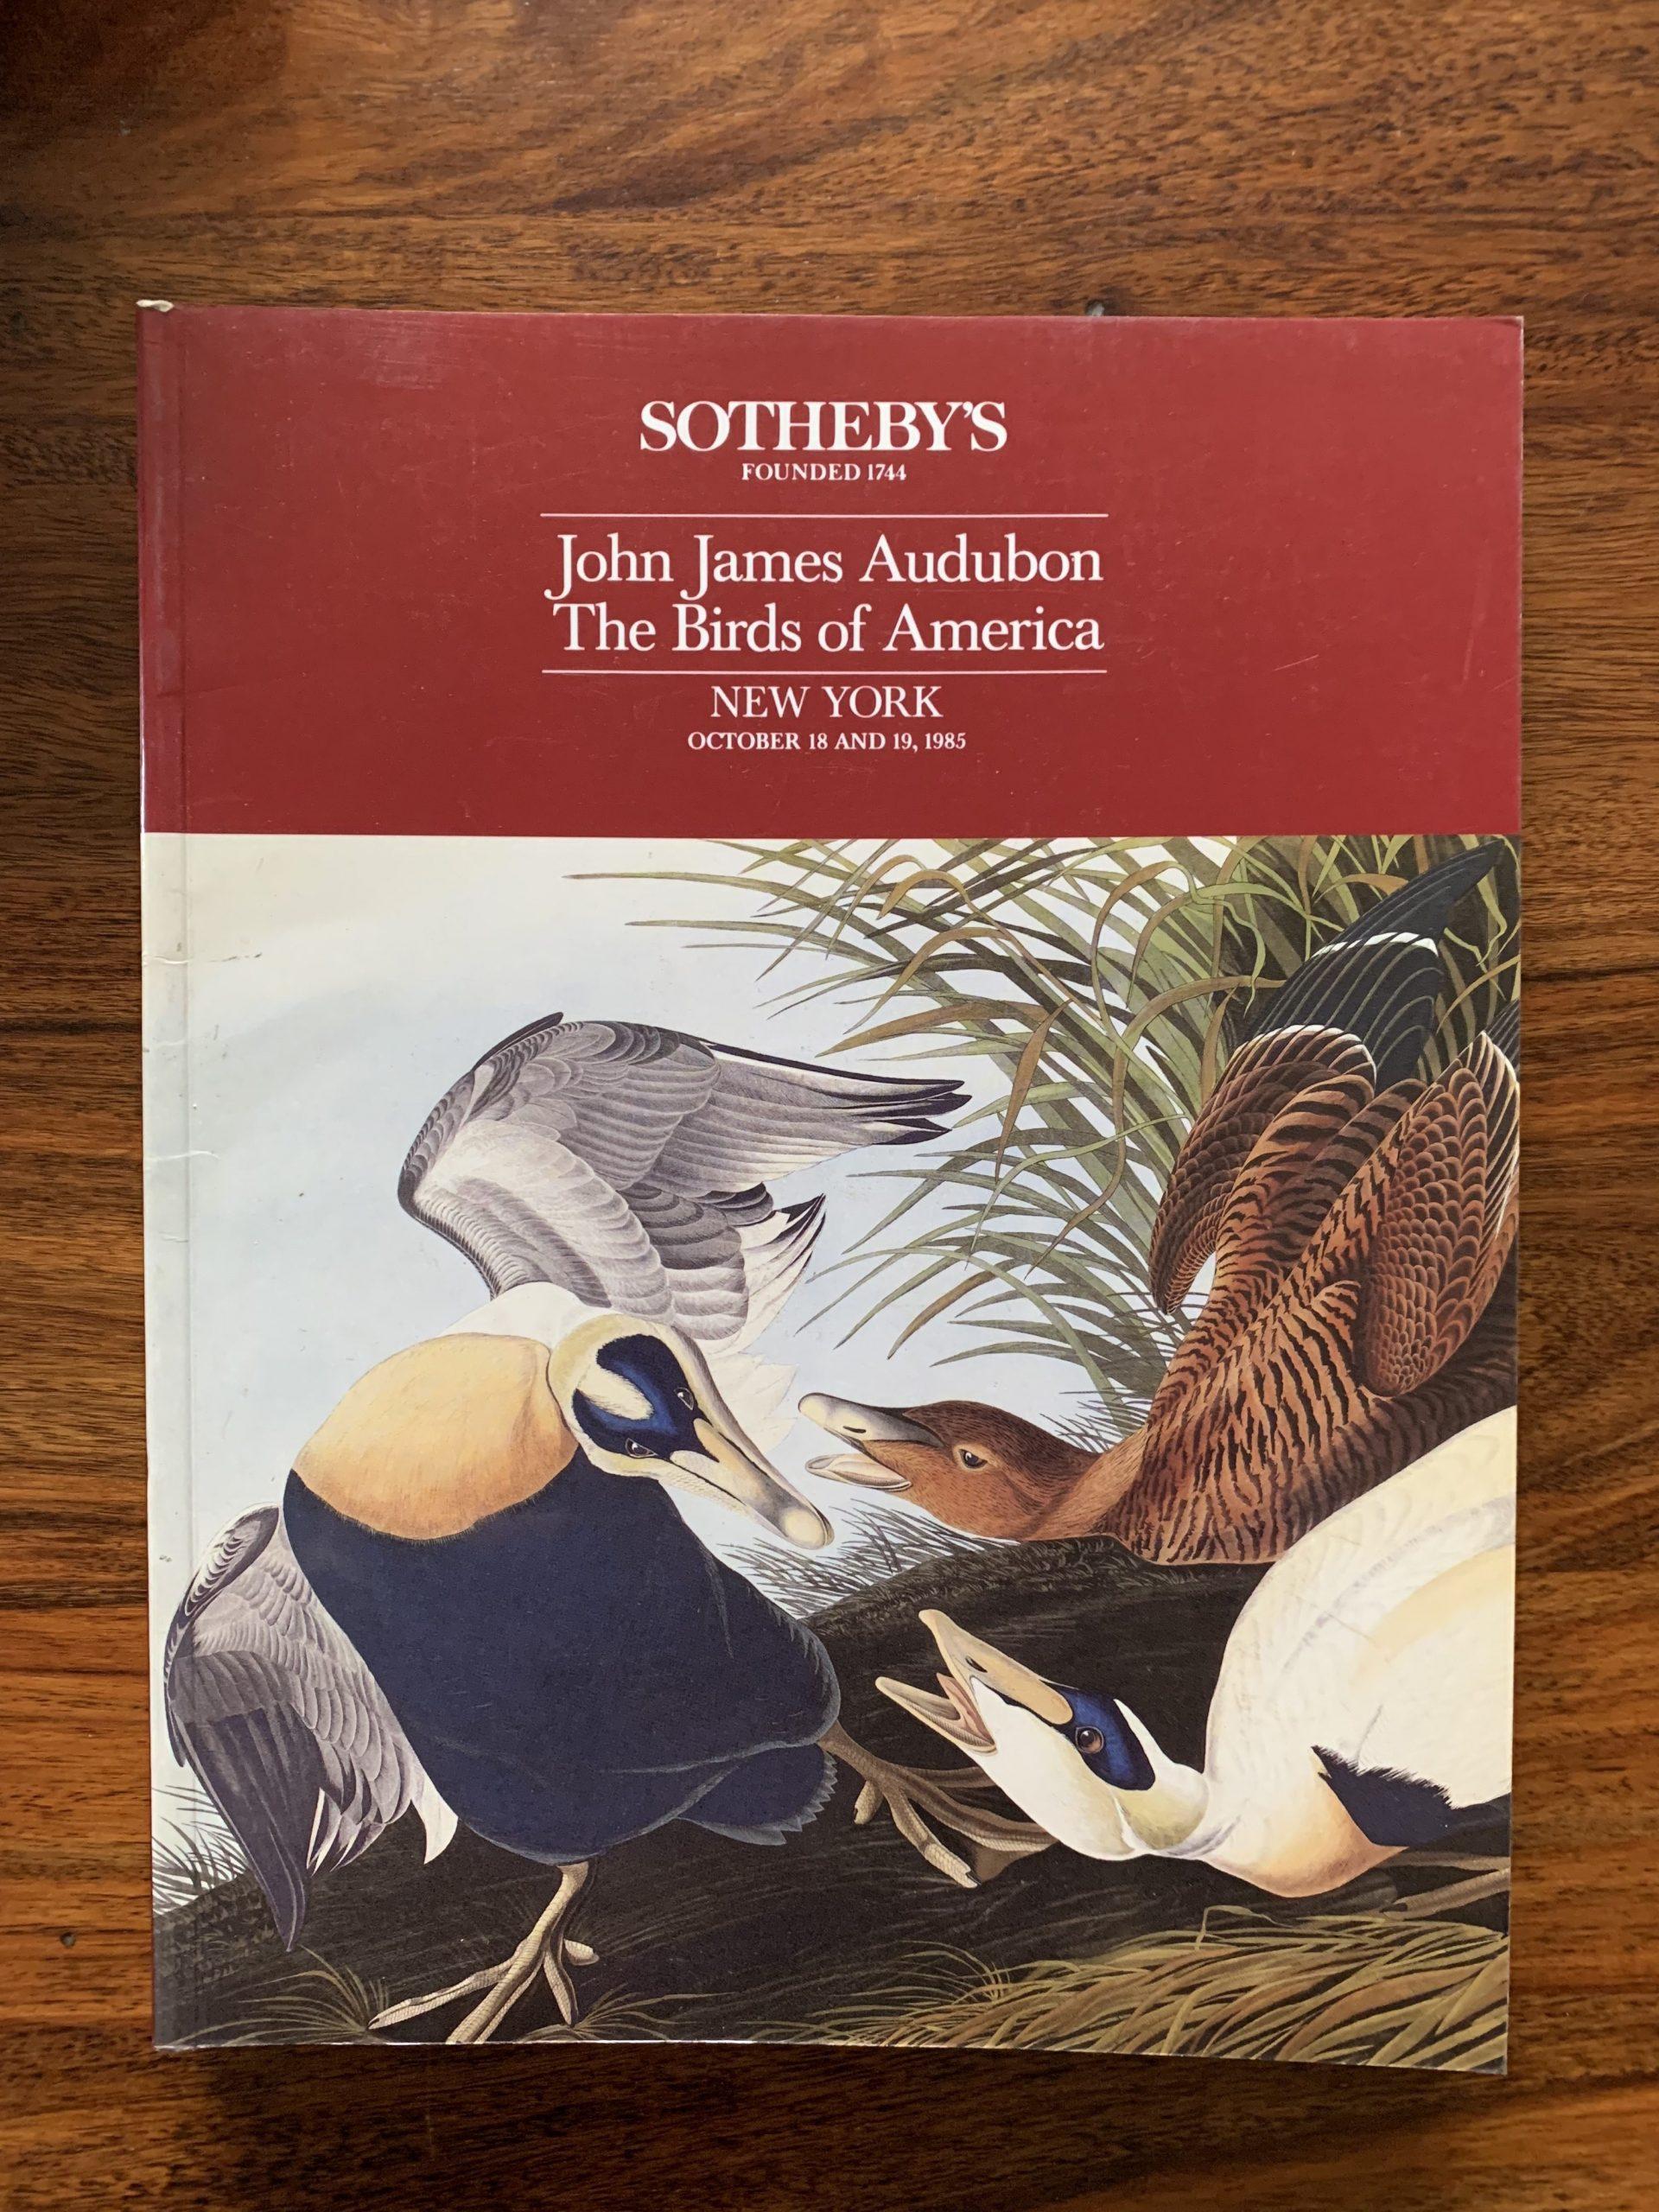 Sotheby's. John James Audubon The Birds of America.